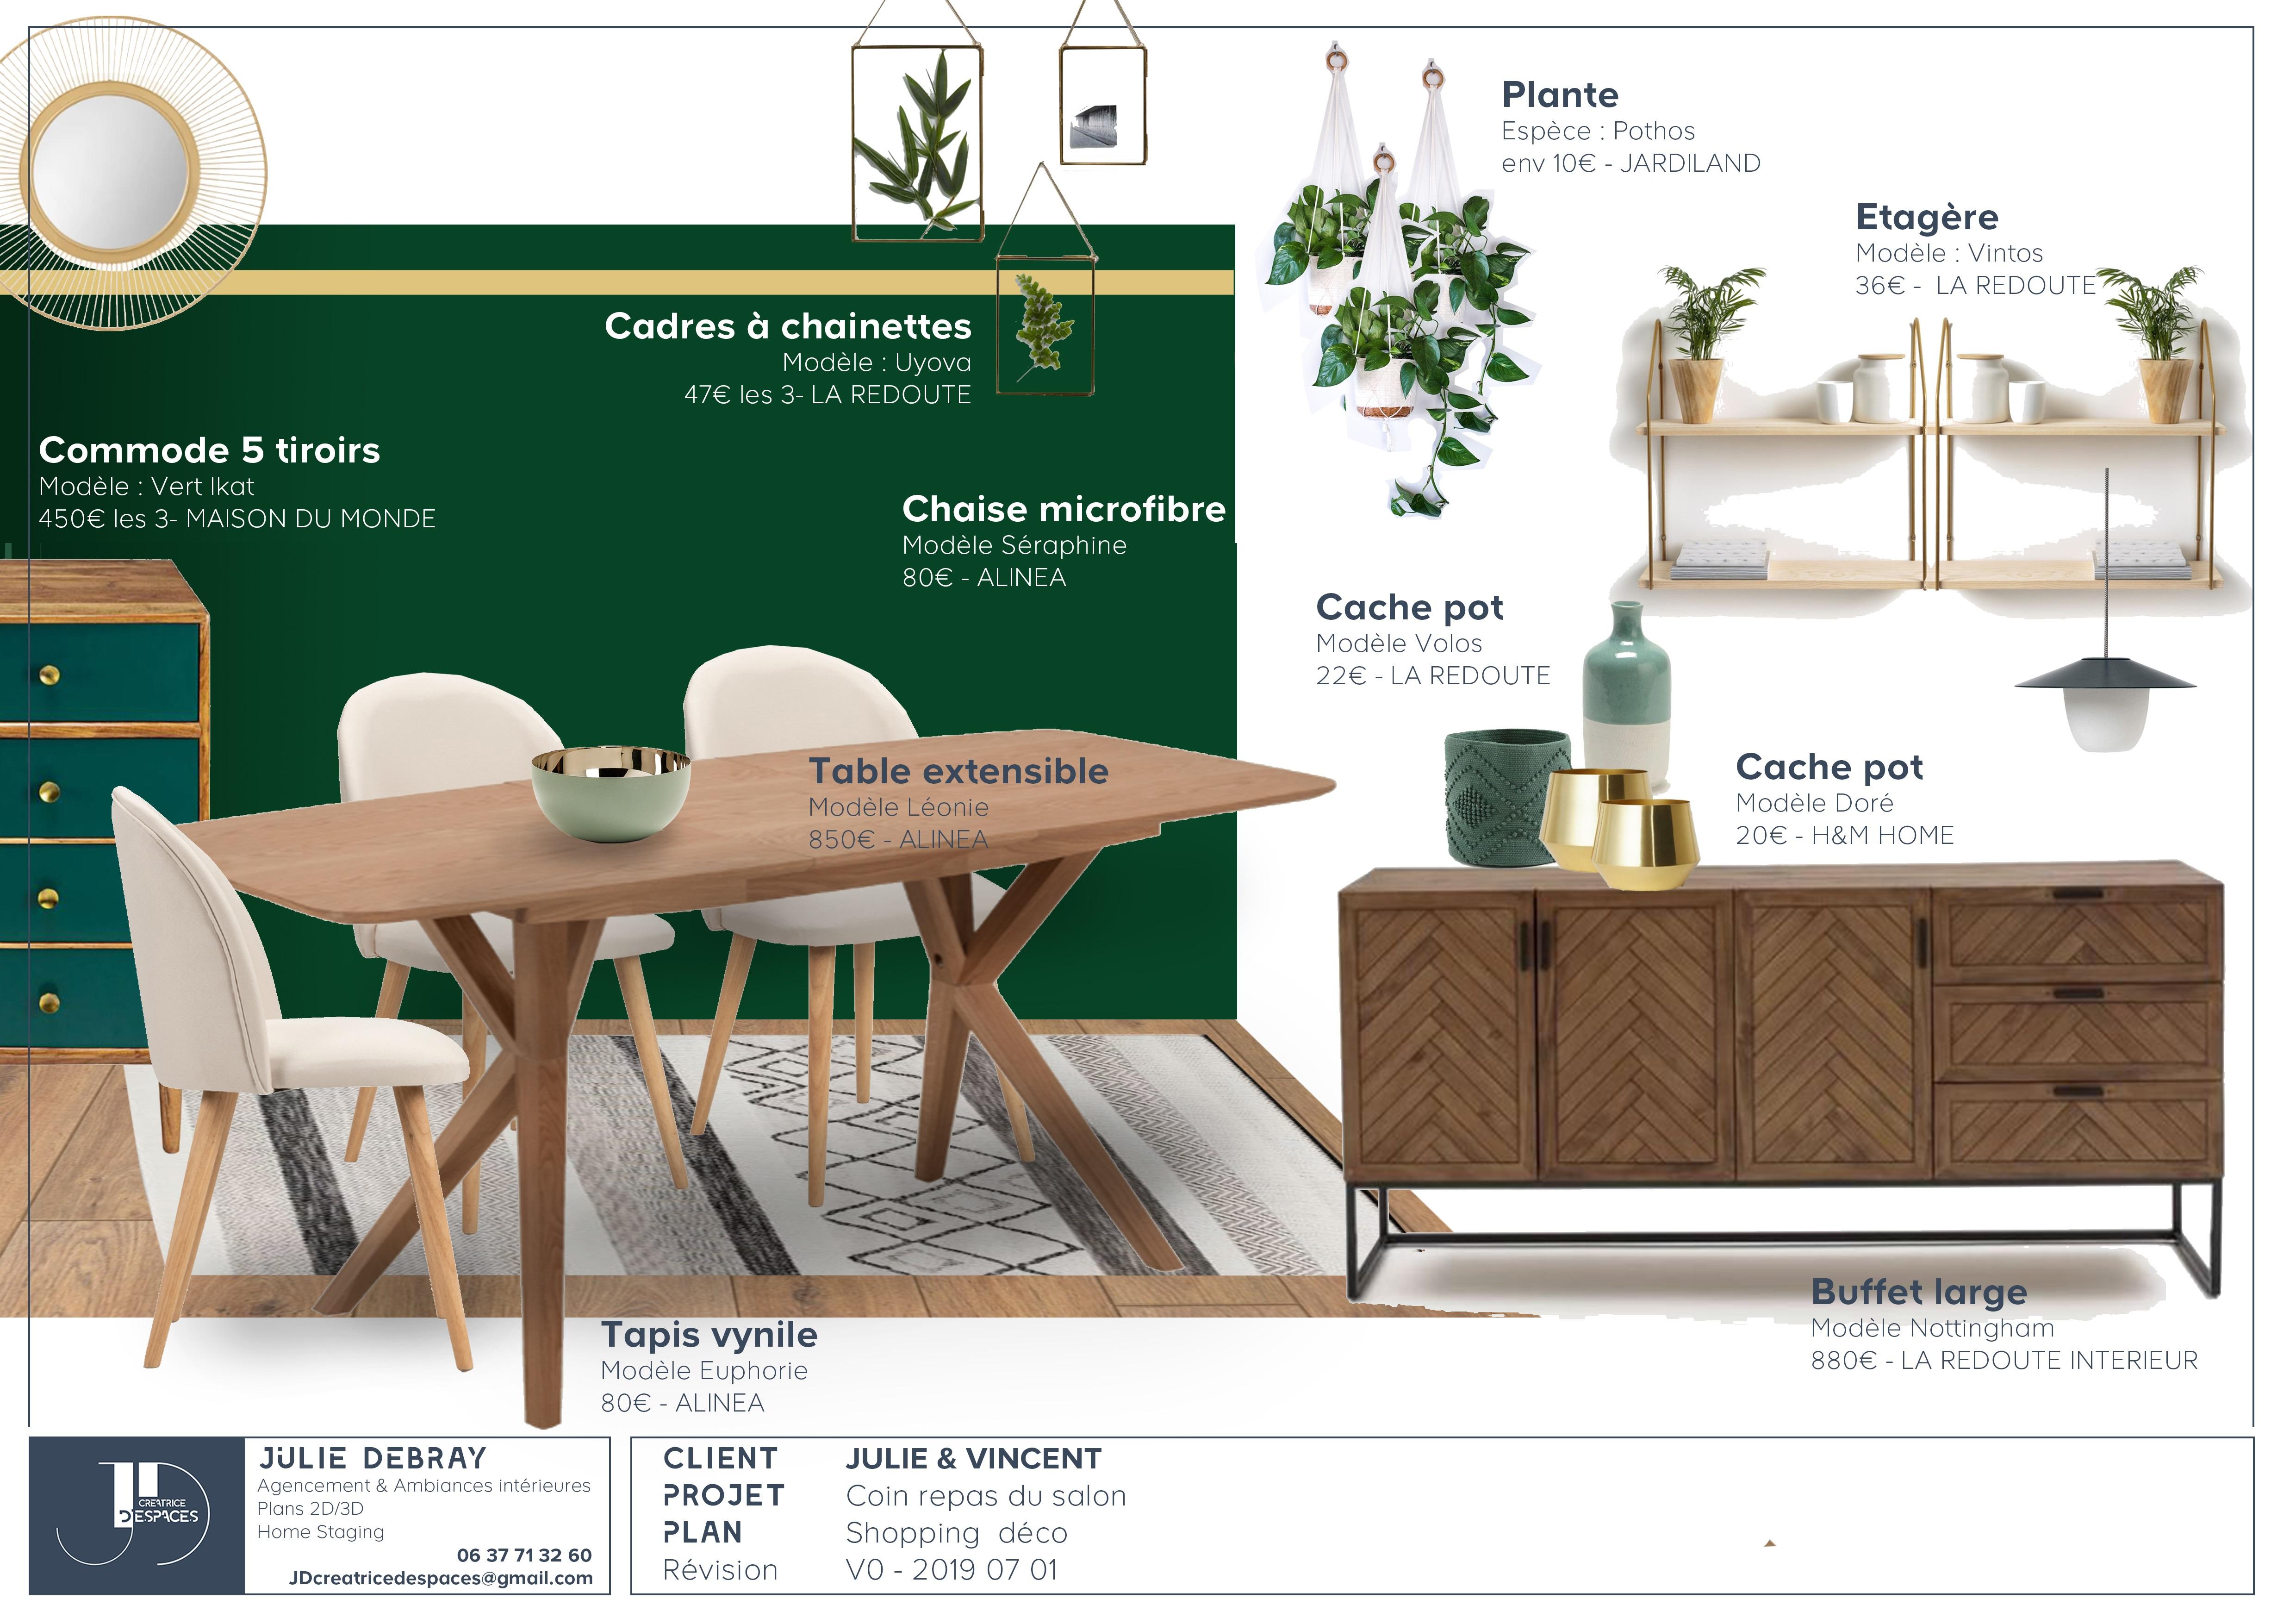 PROJET_J&V_-_Shopping_déco_Coin_repas_po